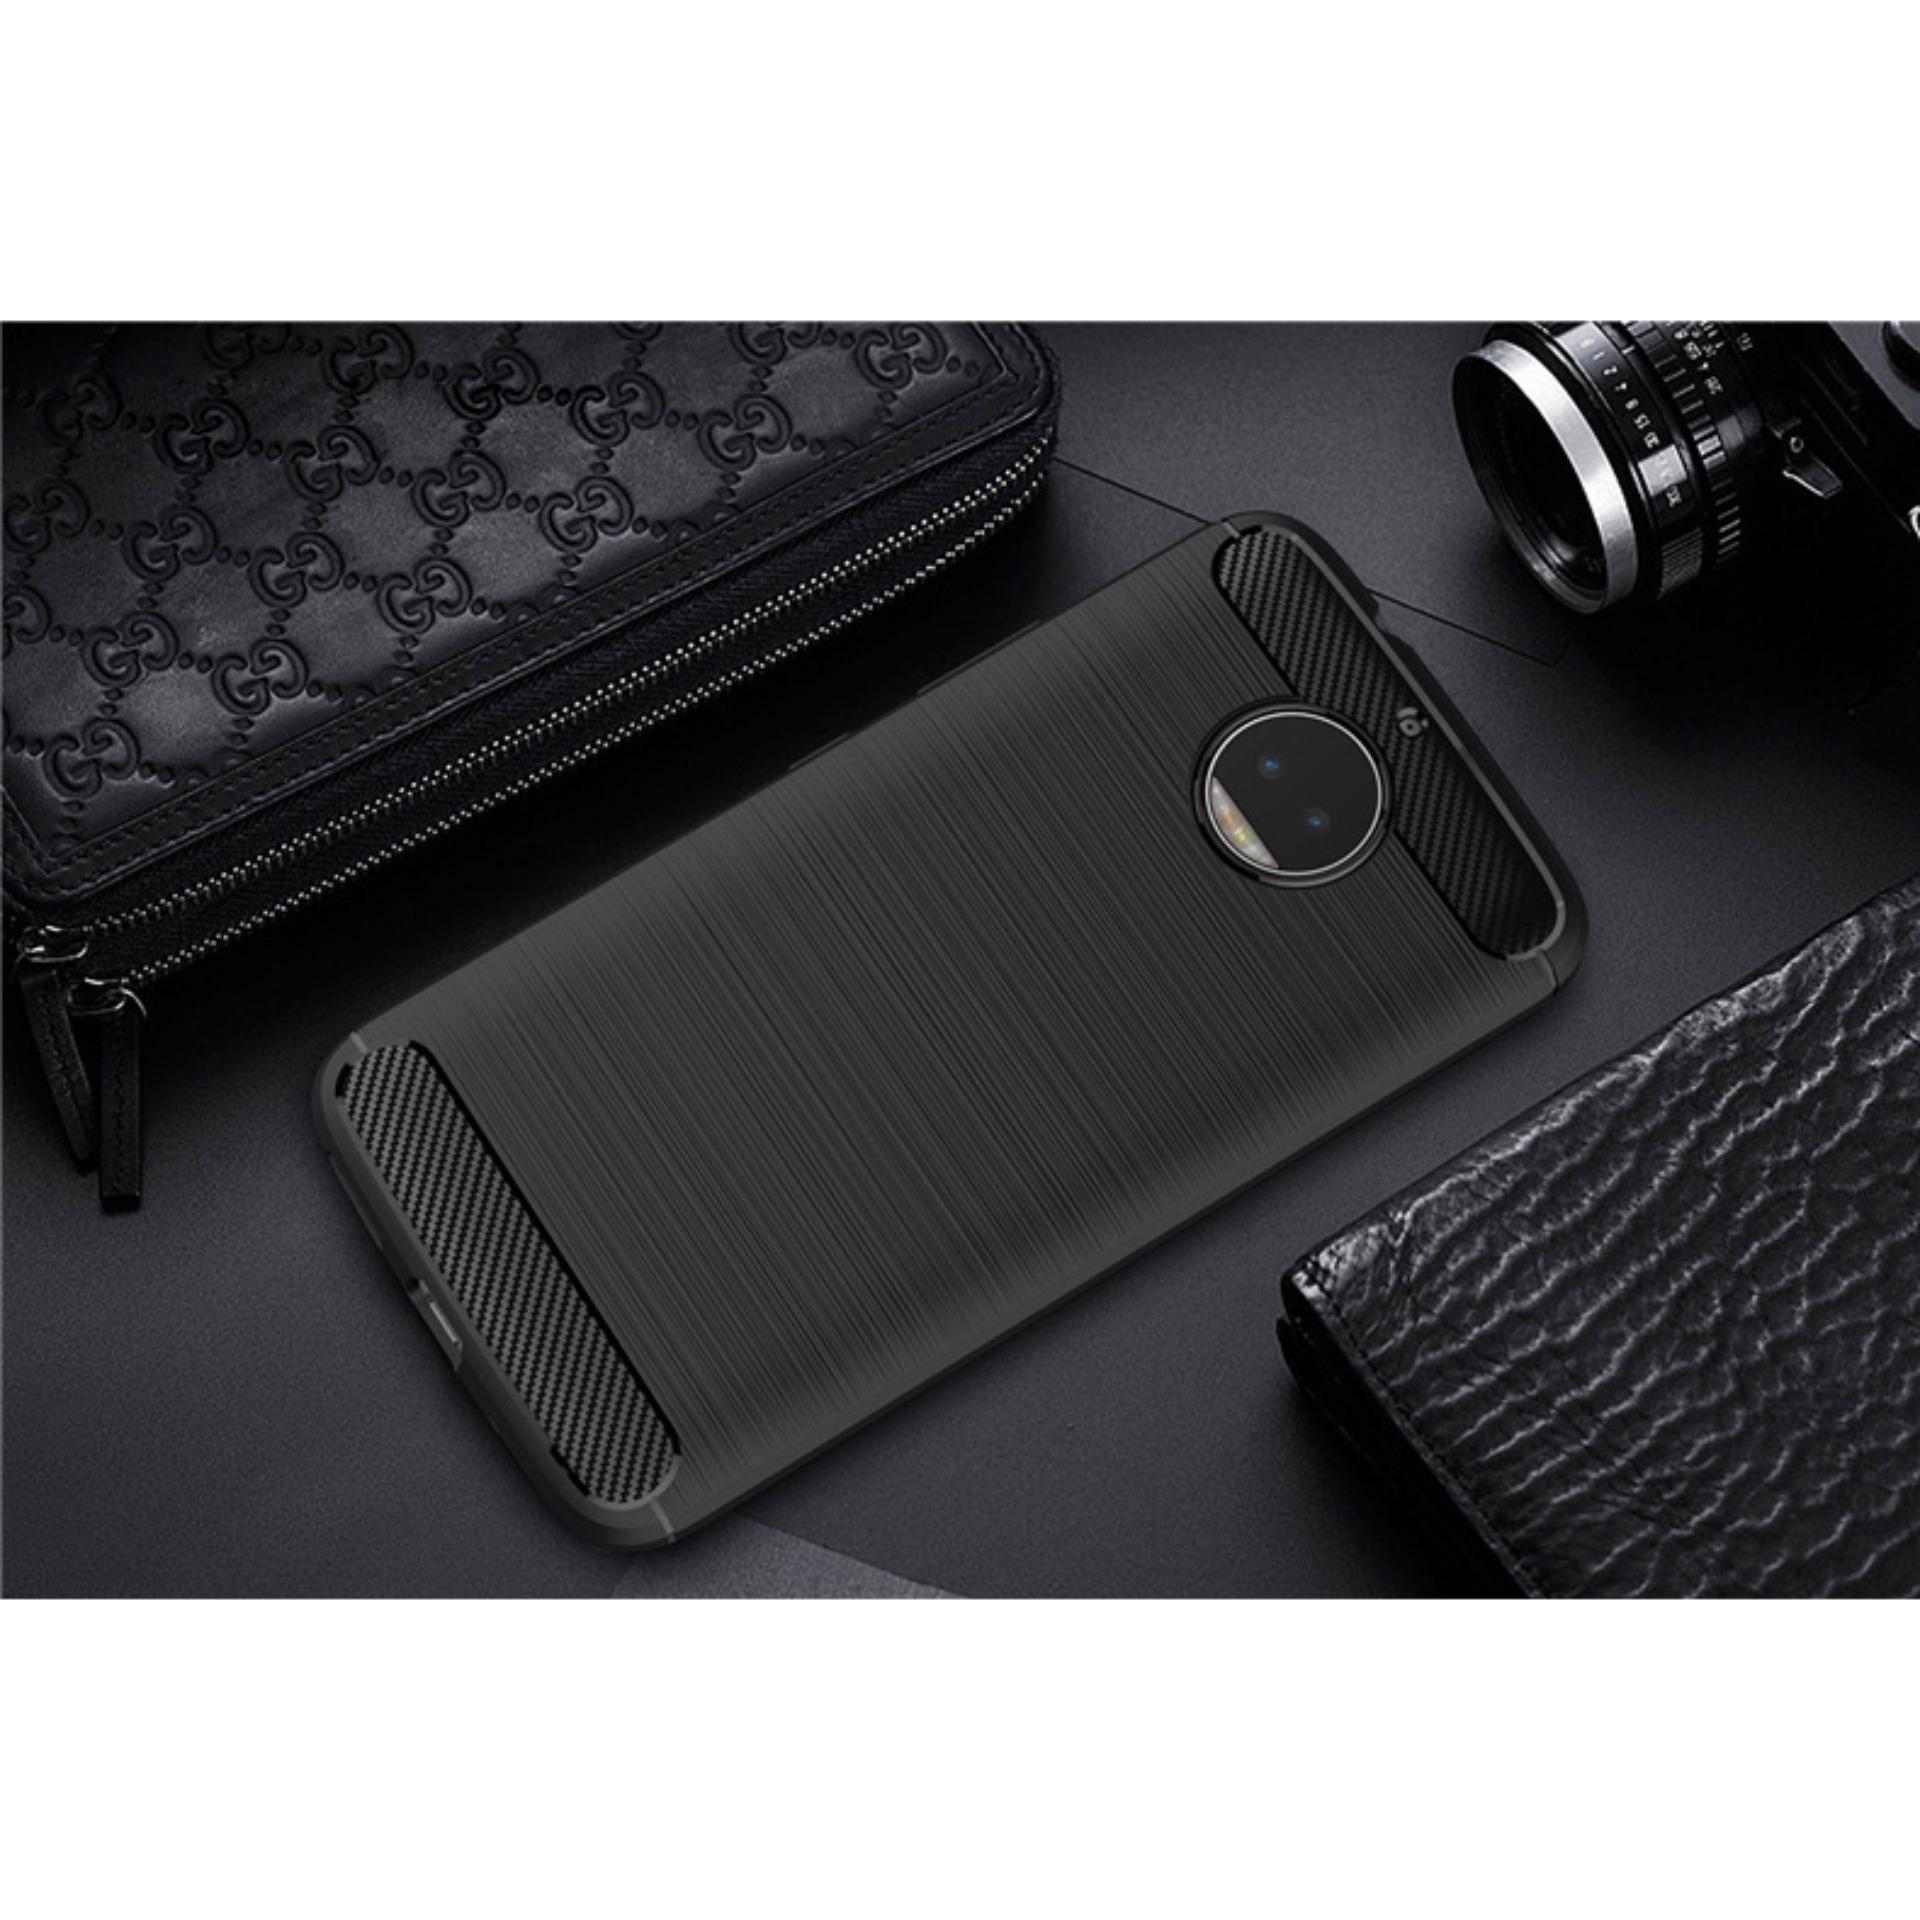 ... Leather Case For Samsung Galaxy J7 Pro 2017 / J730 ... Source ... Kenzoe Super Premium Quality Carbon Shockproof Hybrid Case For Motorola Moto G5s Plus .